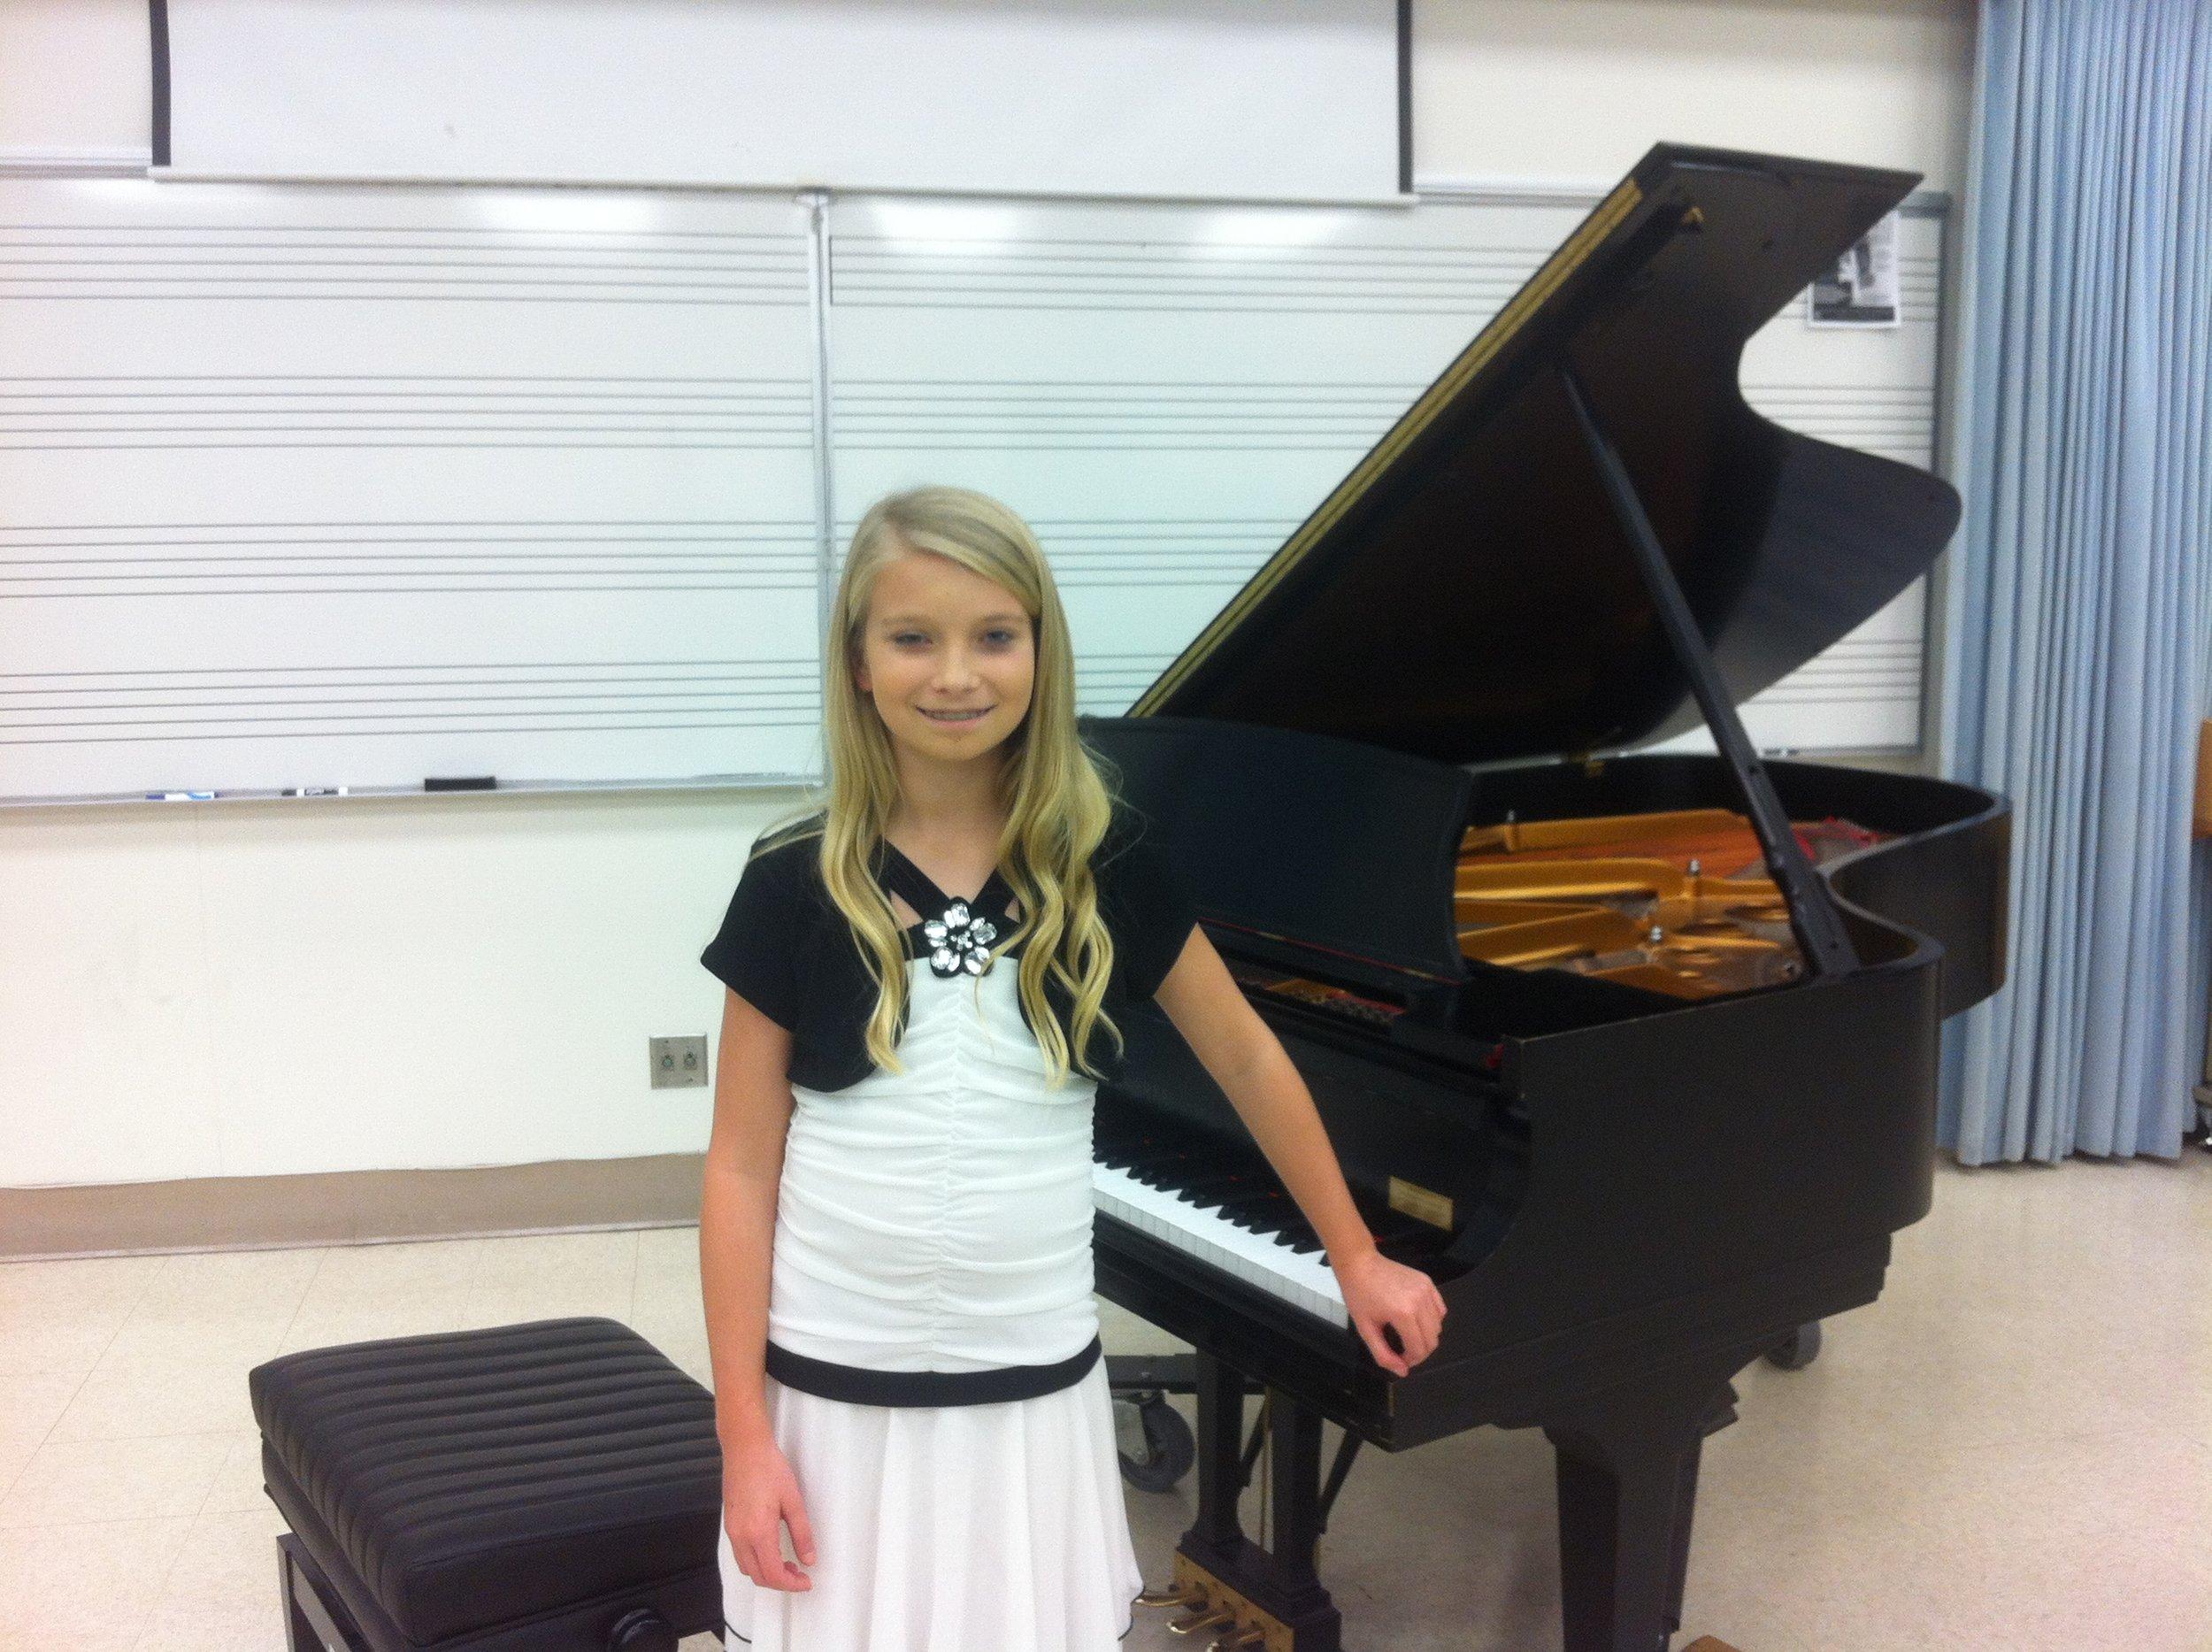 Piano Festival at Saddleback College